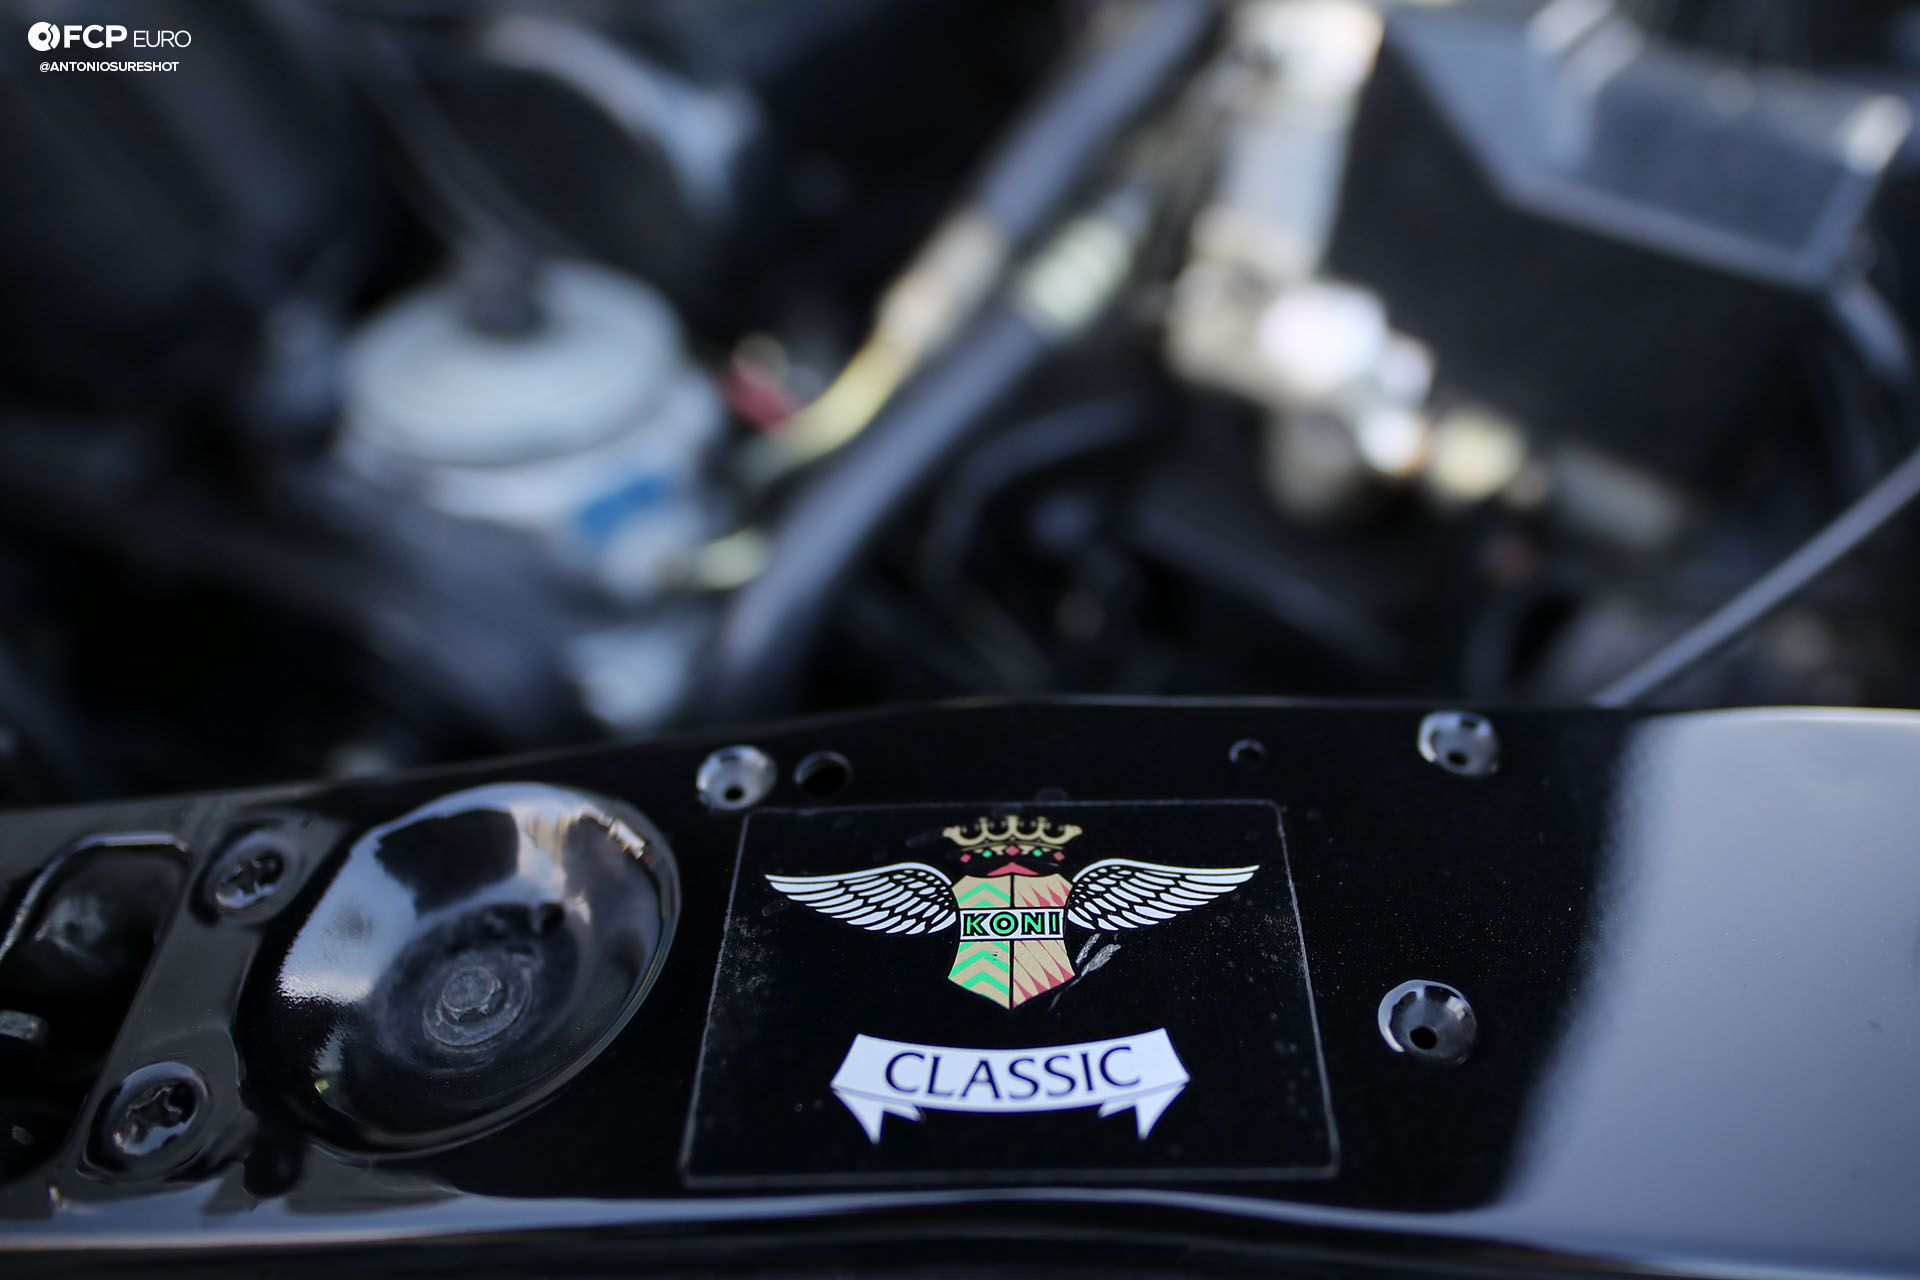 Koni Classic Liberty VIP Mercedes-Benz 420SEL LWB